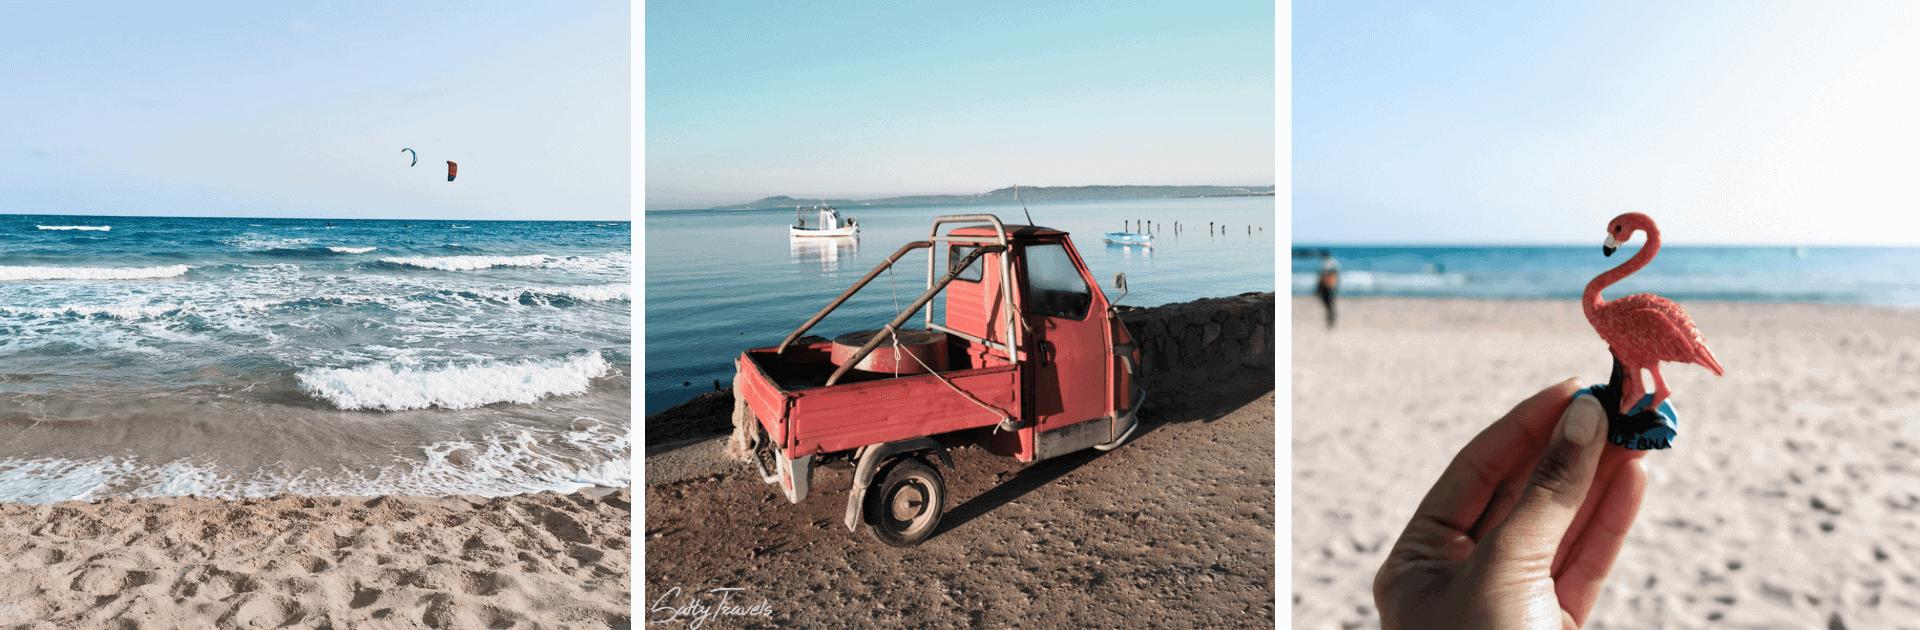 Włochy Salty Travels Blog